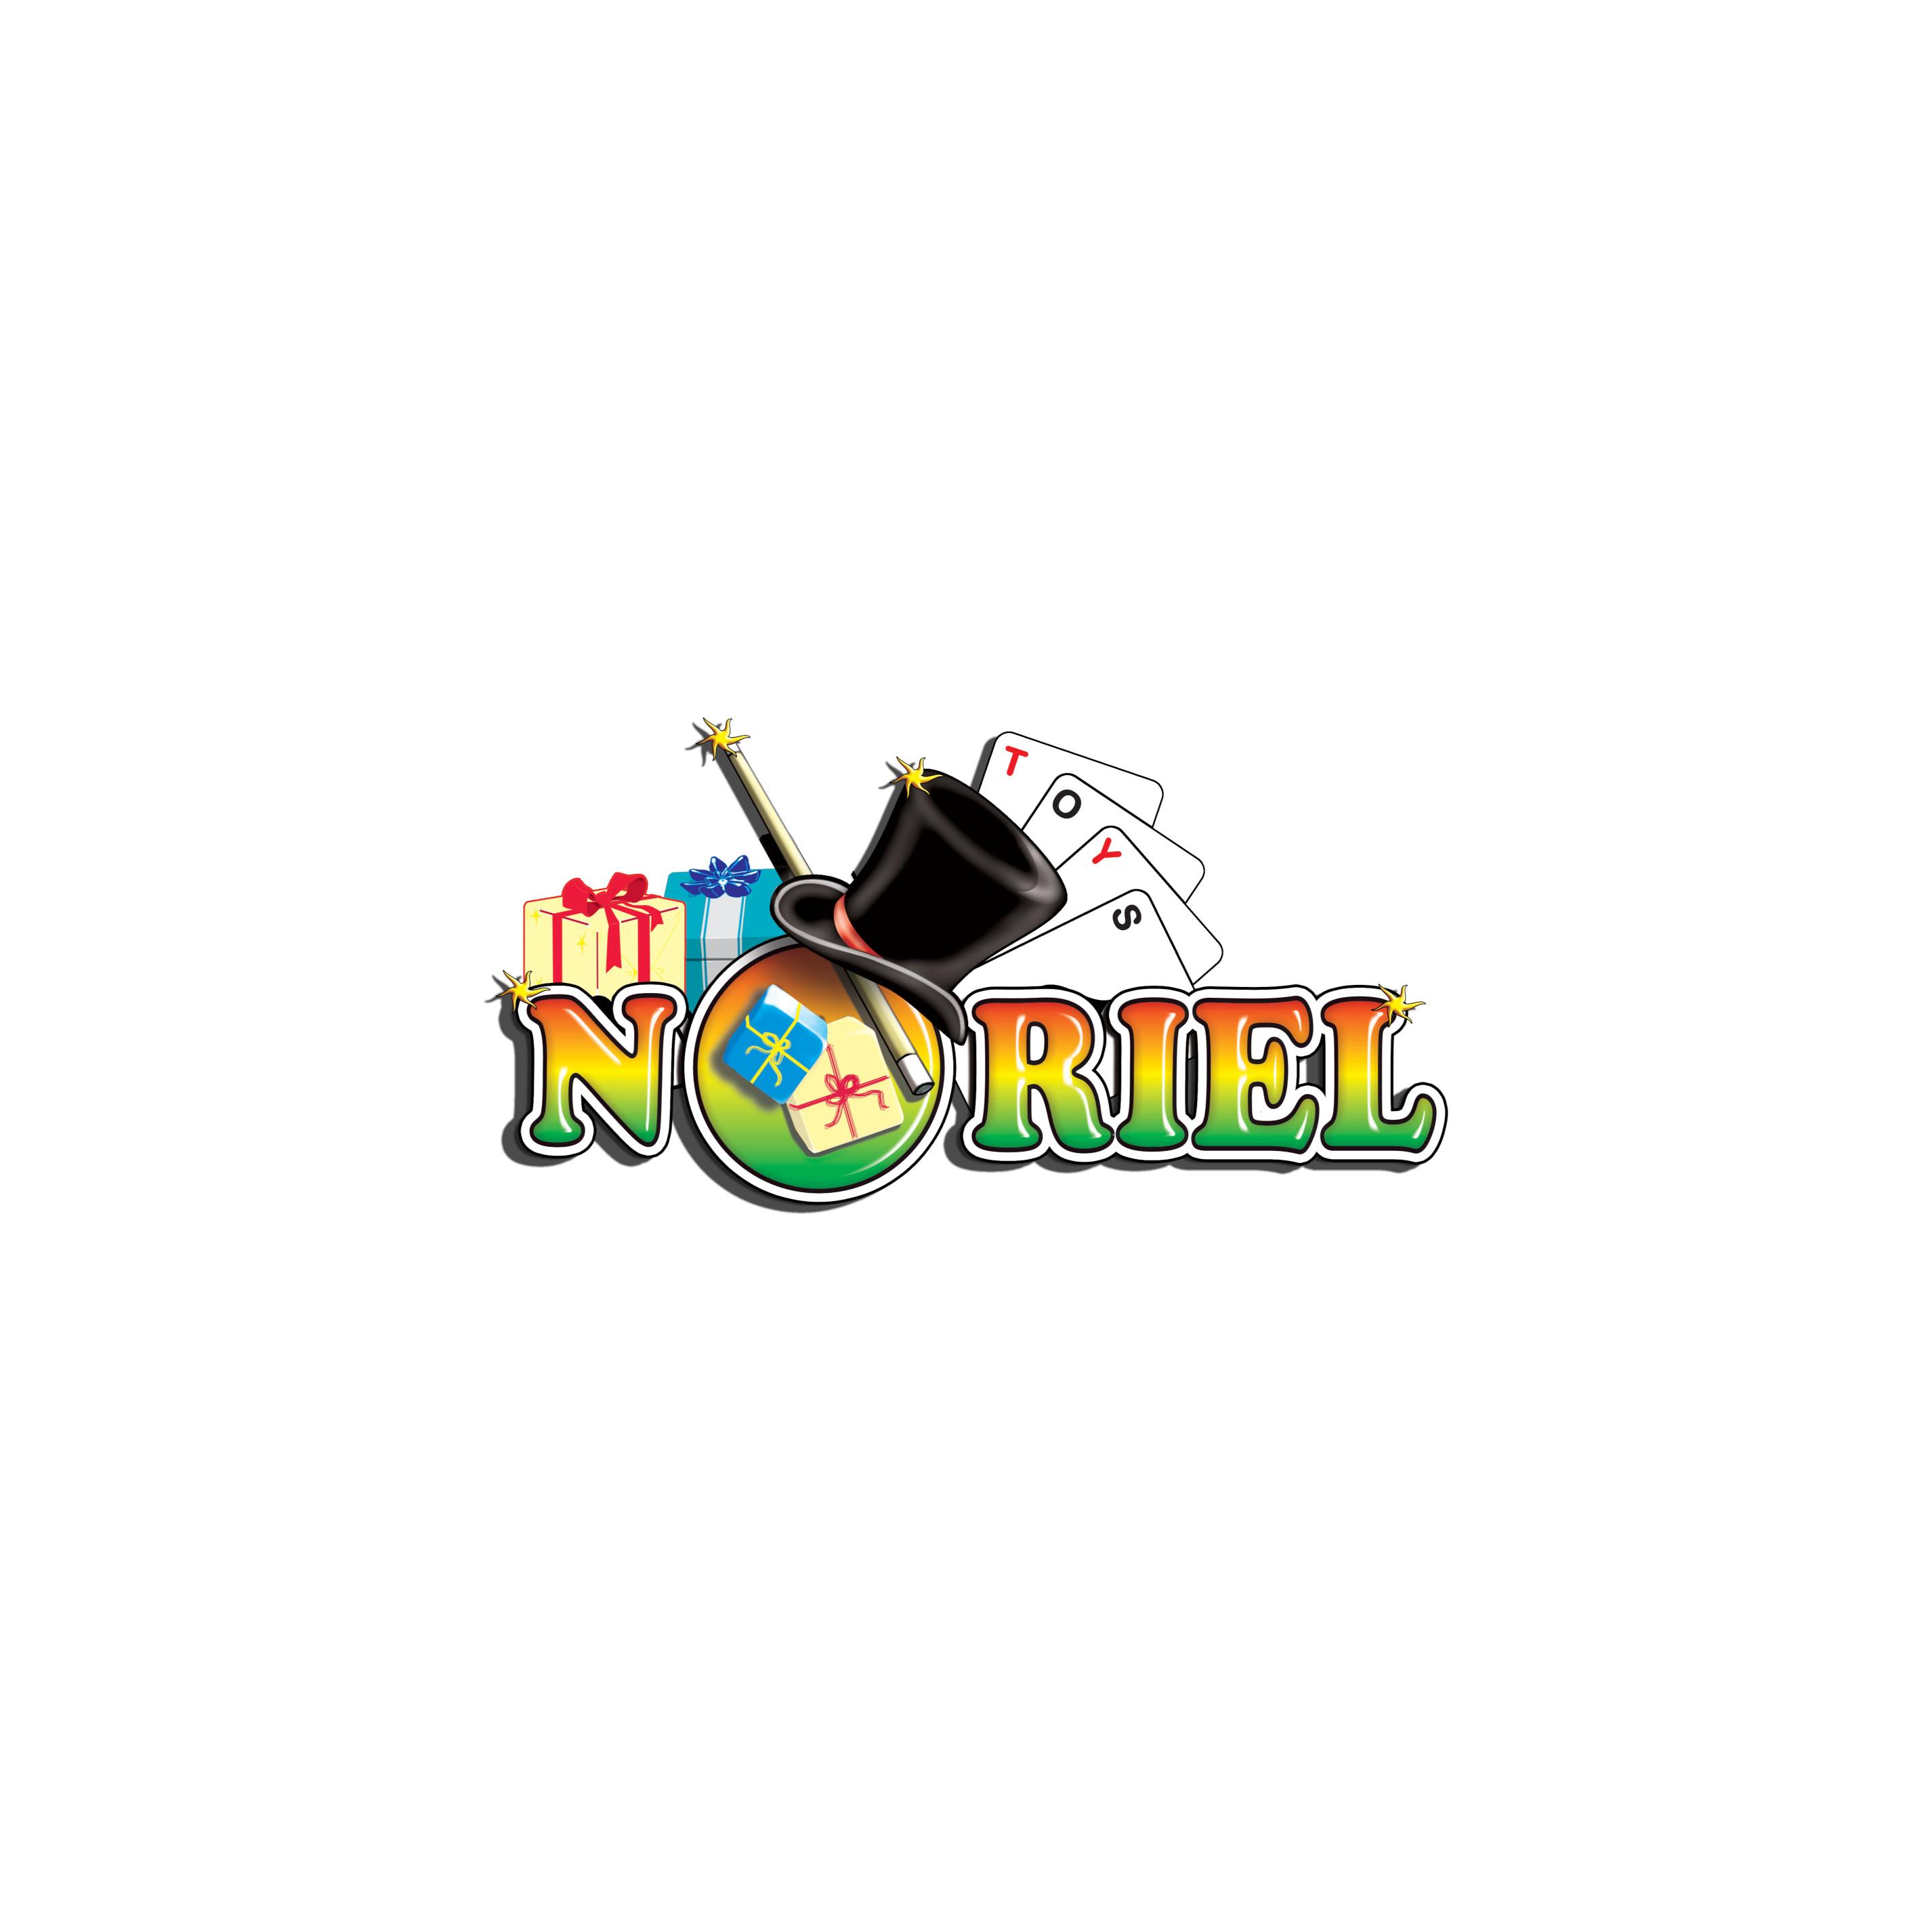 073590_001 Jucarie bebelusi B Kids - Elefant